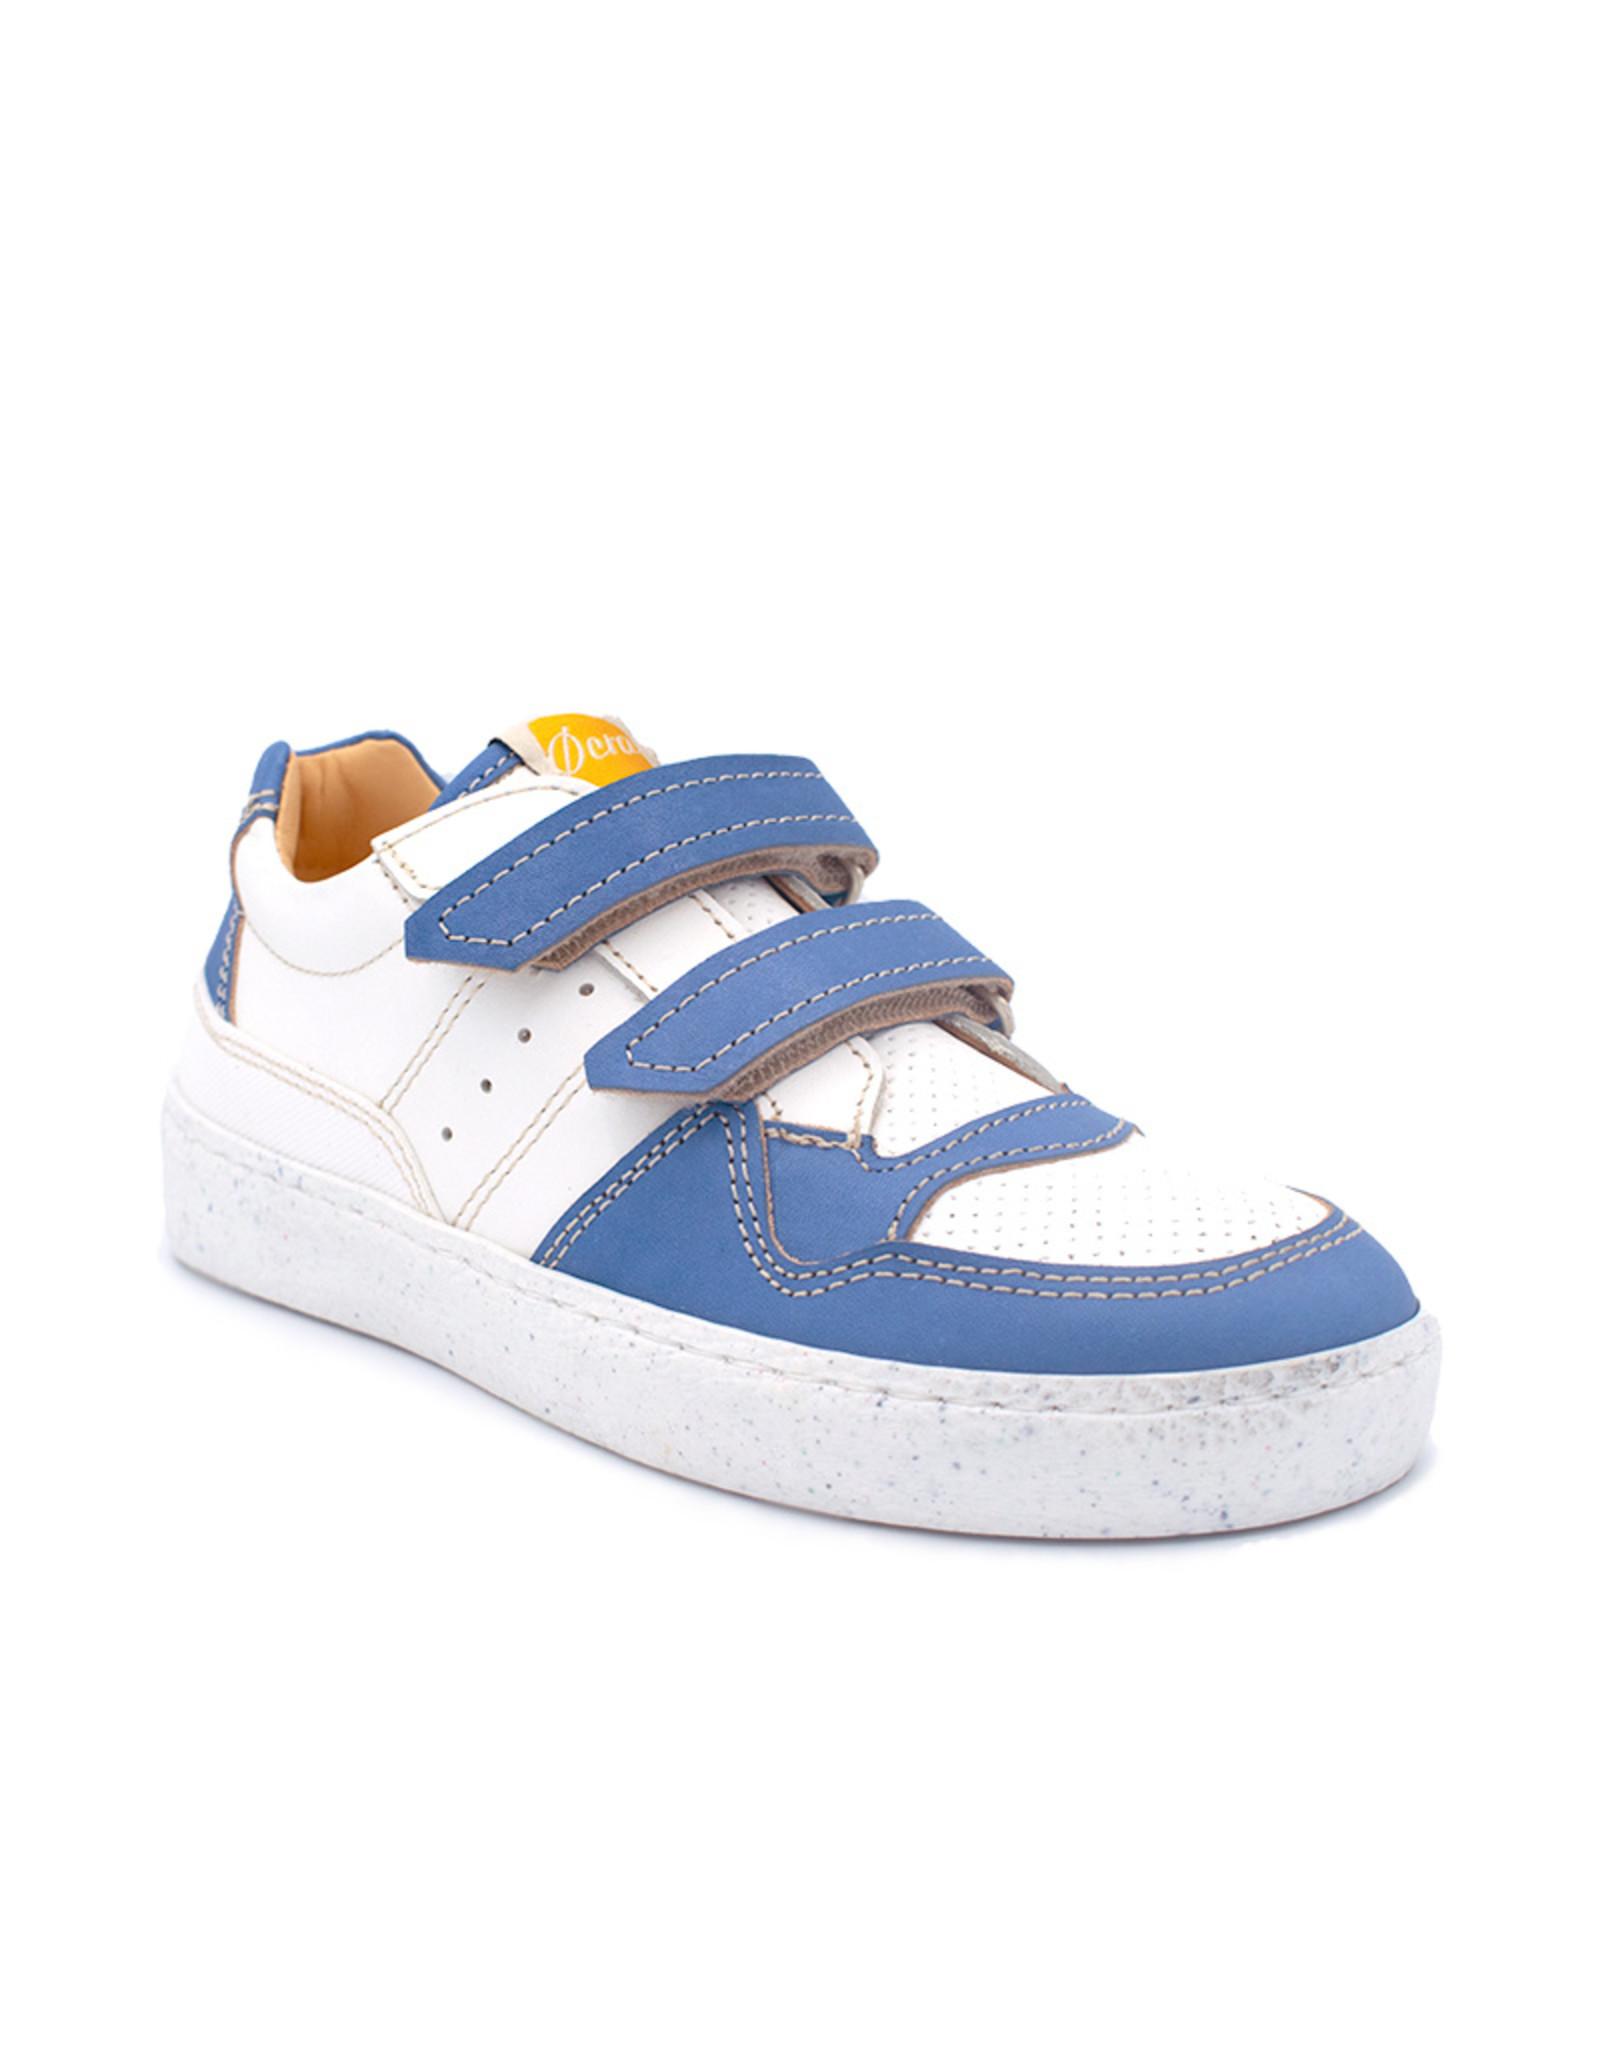 OCRA sneaker blauw wit velcro